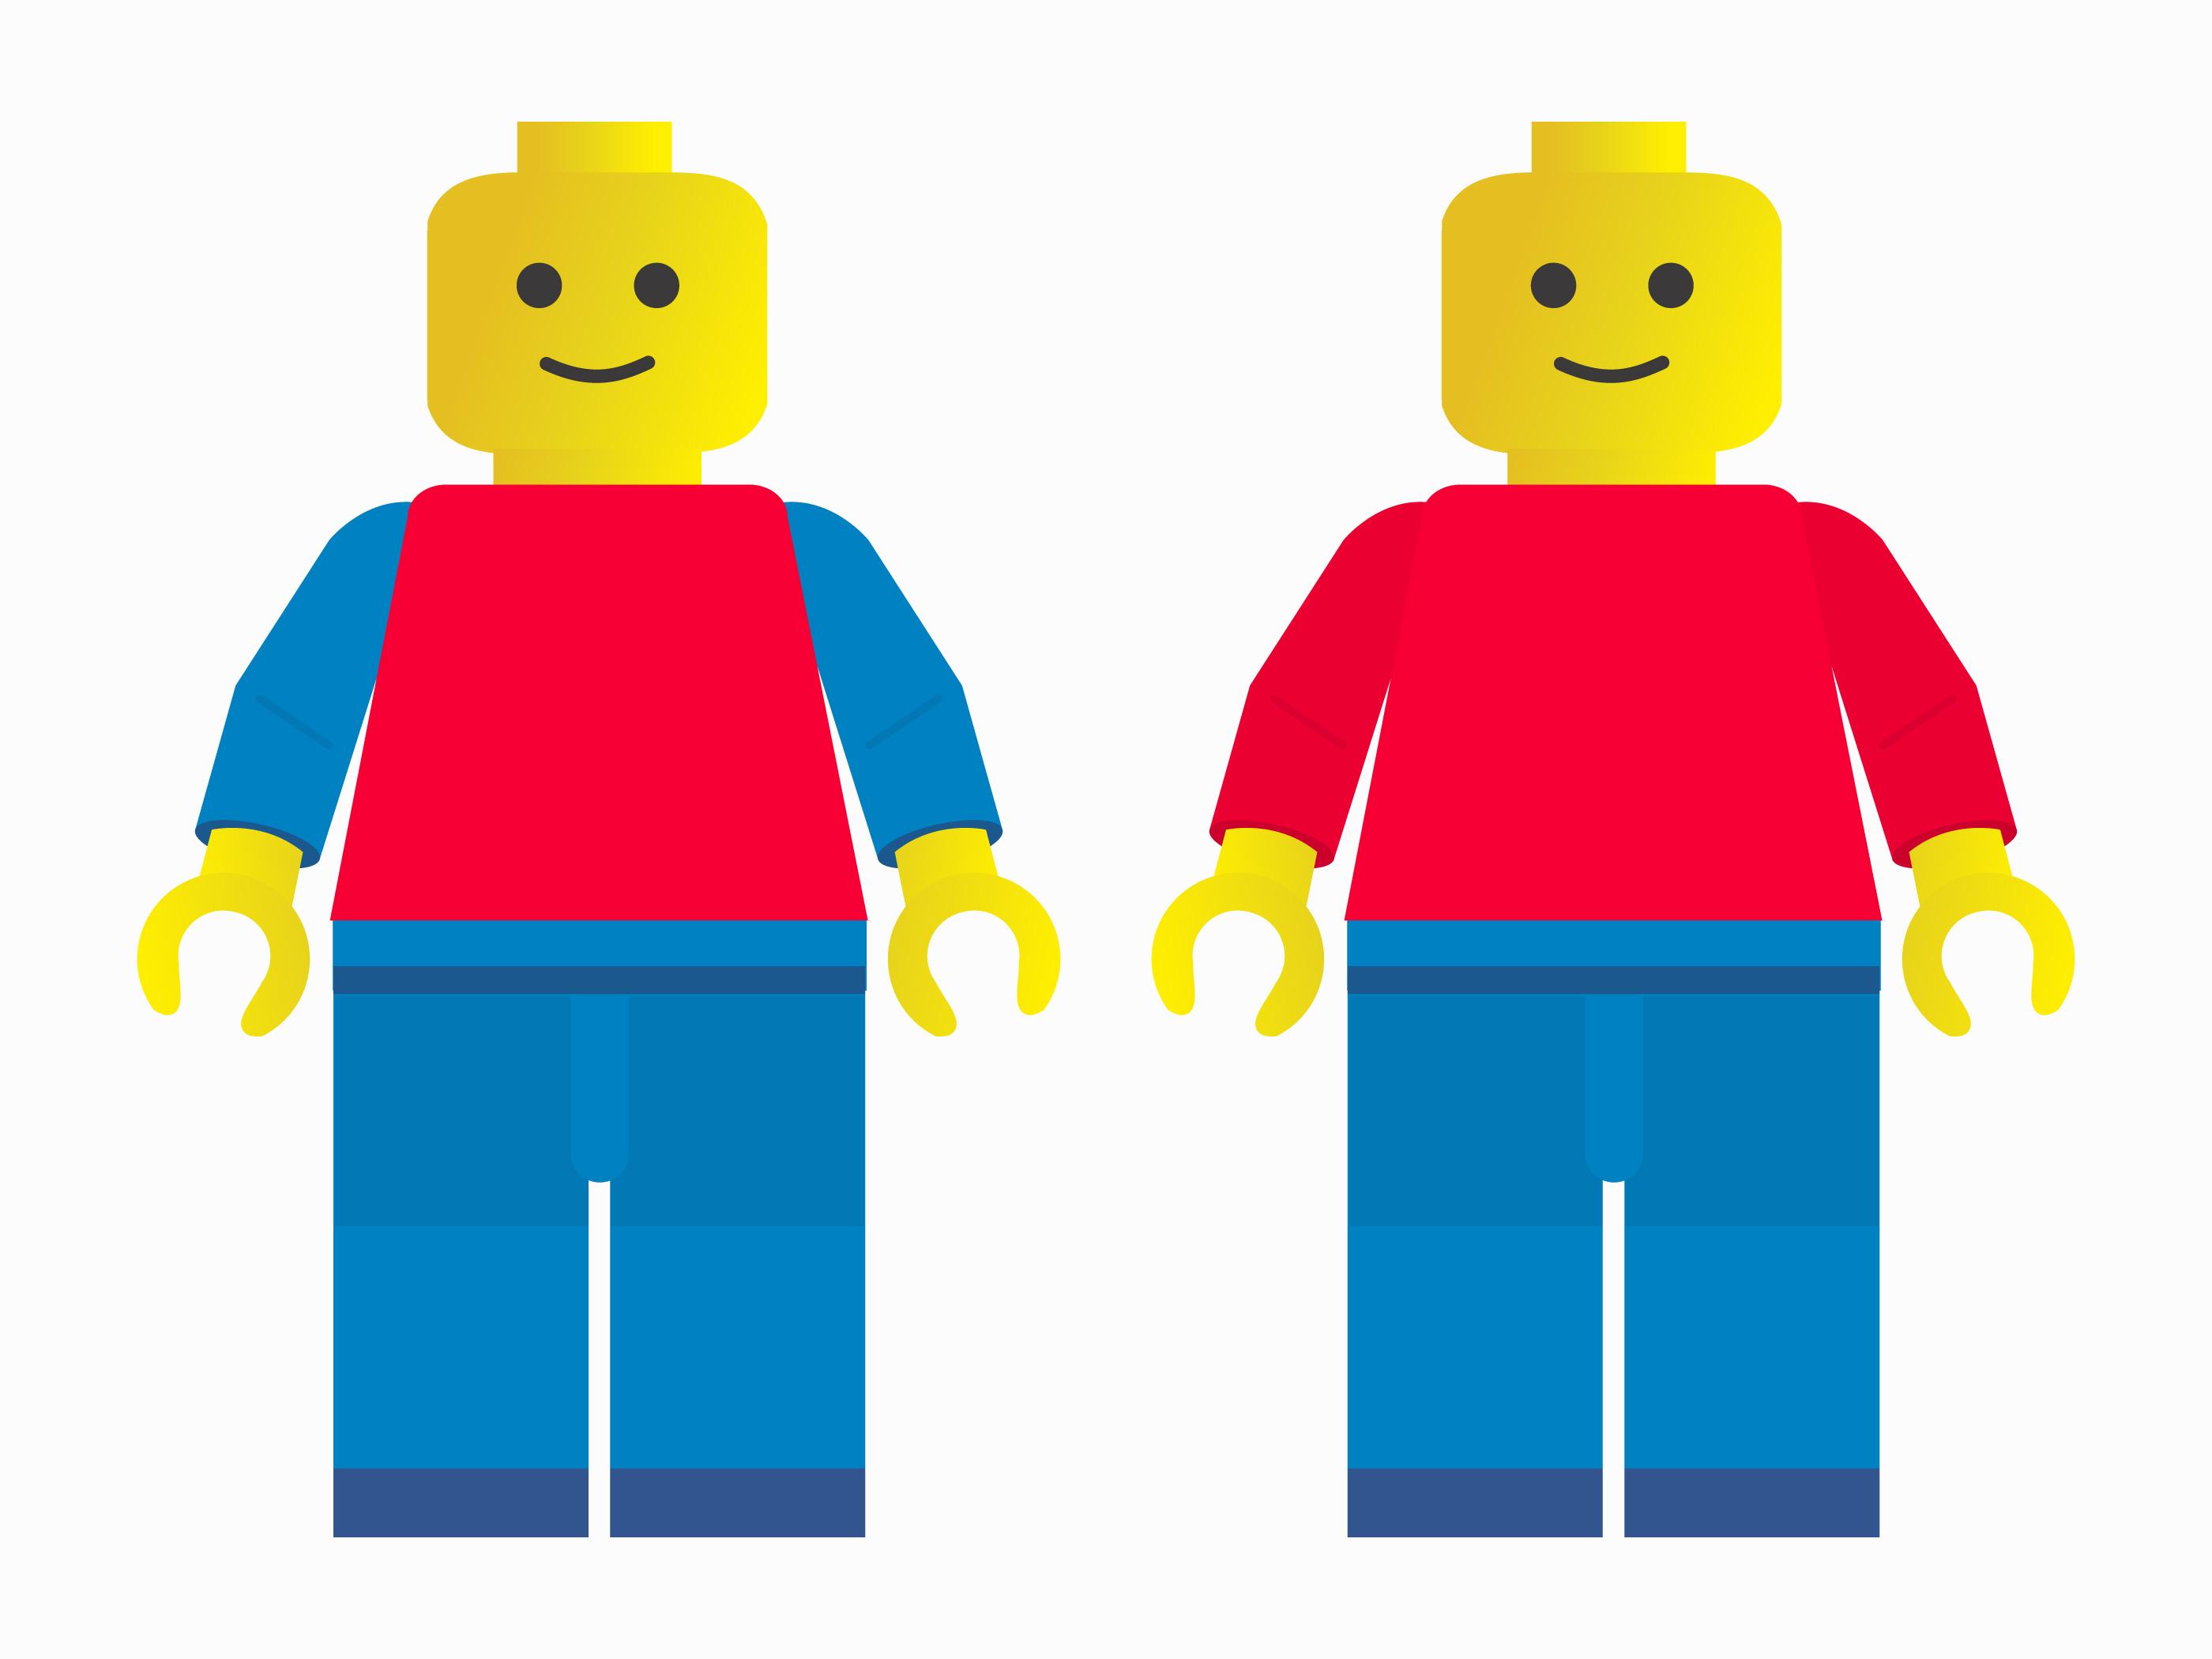 Download Free SVG Lego Vector Man - Download Free Vector Art, Stock ...